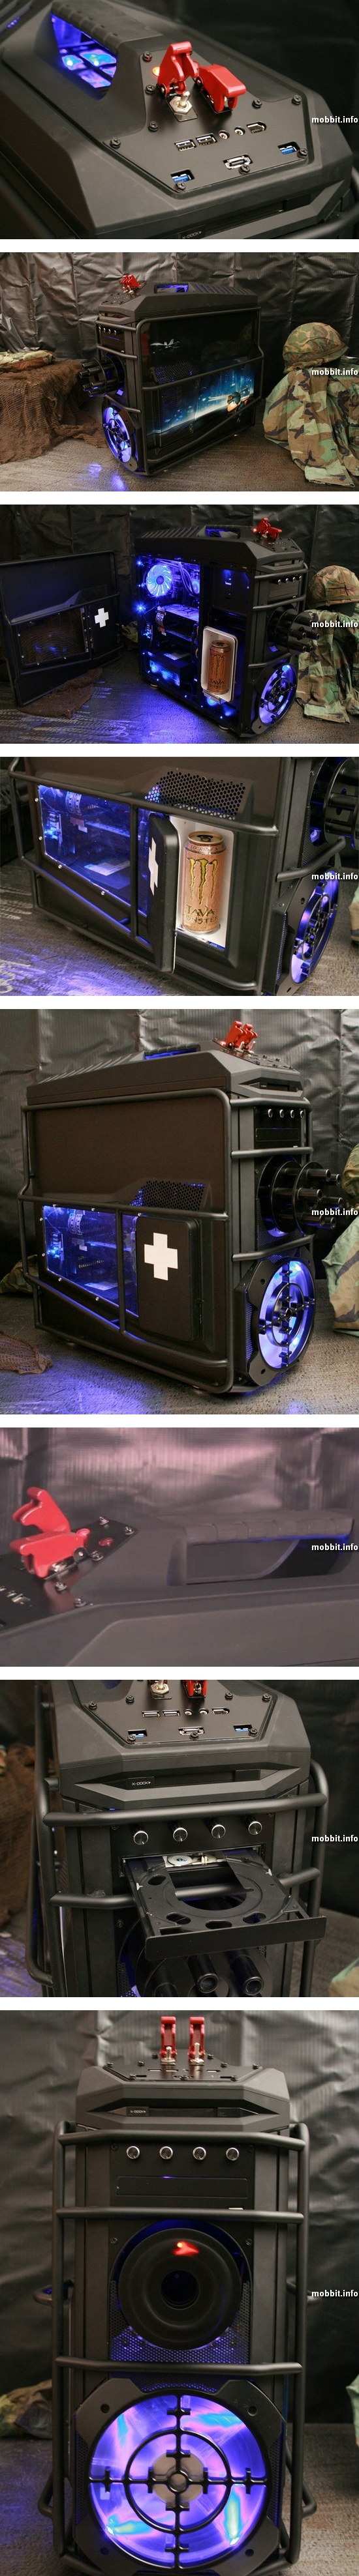 Компьютерный корпус-пулемет в стиле Battlefield 3